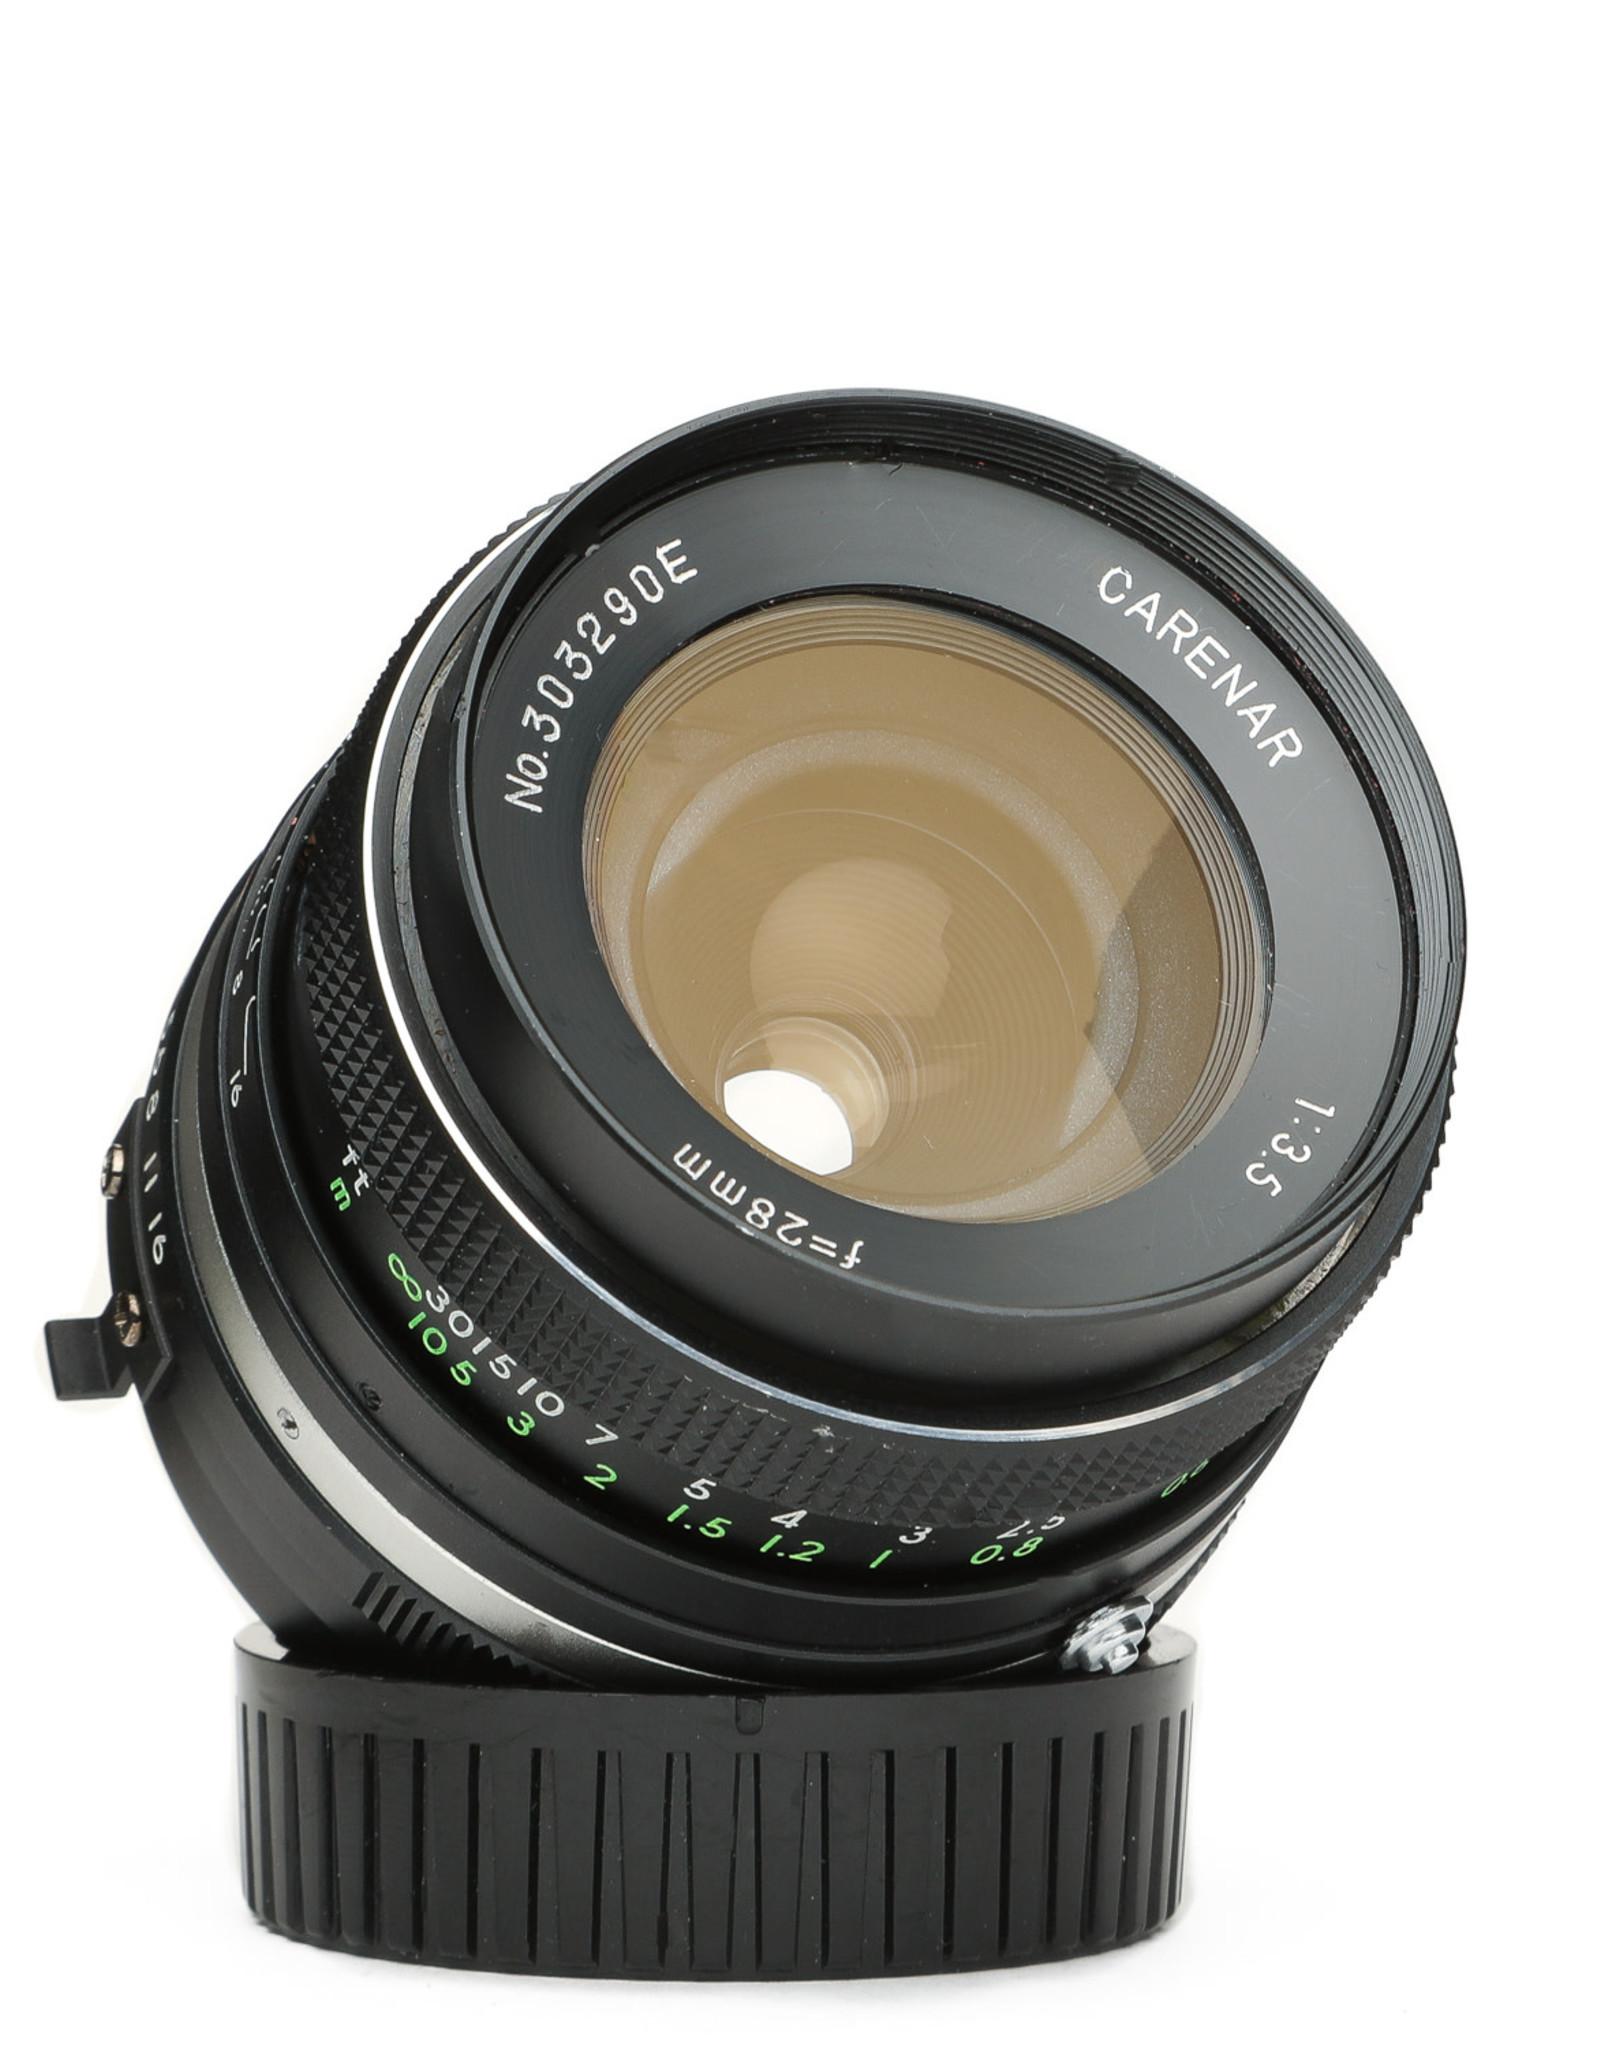 Carenar Carenar 28mm f/3.5 Lens for Olympus MD